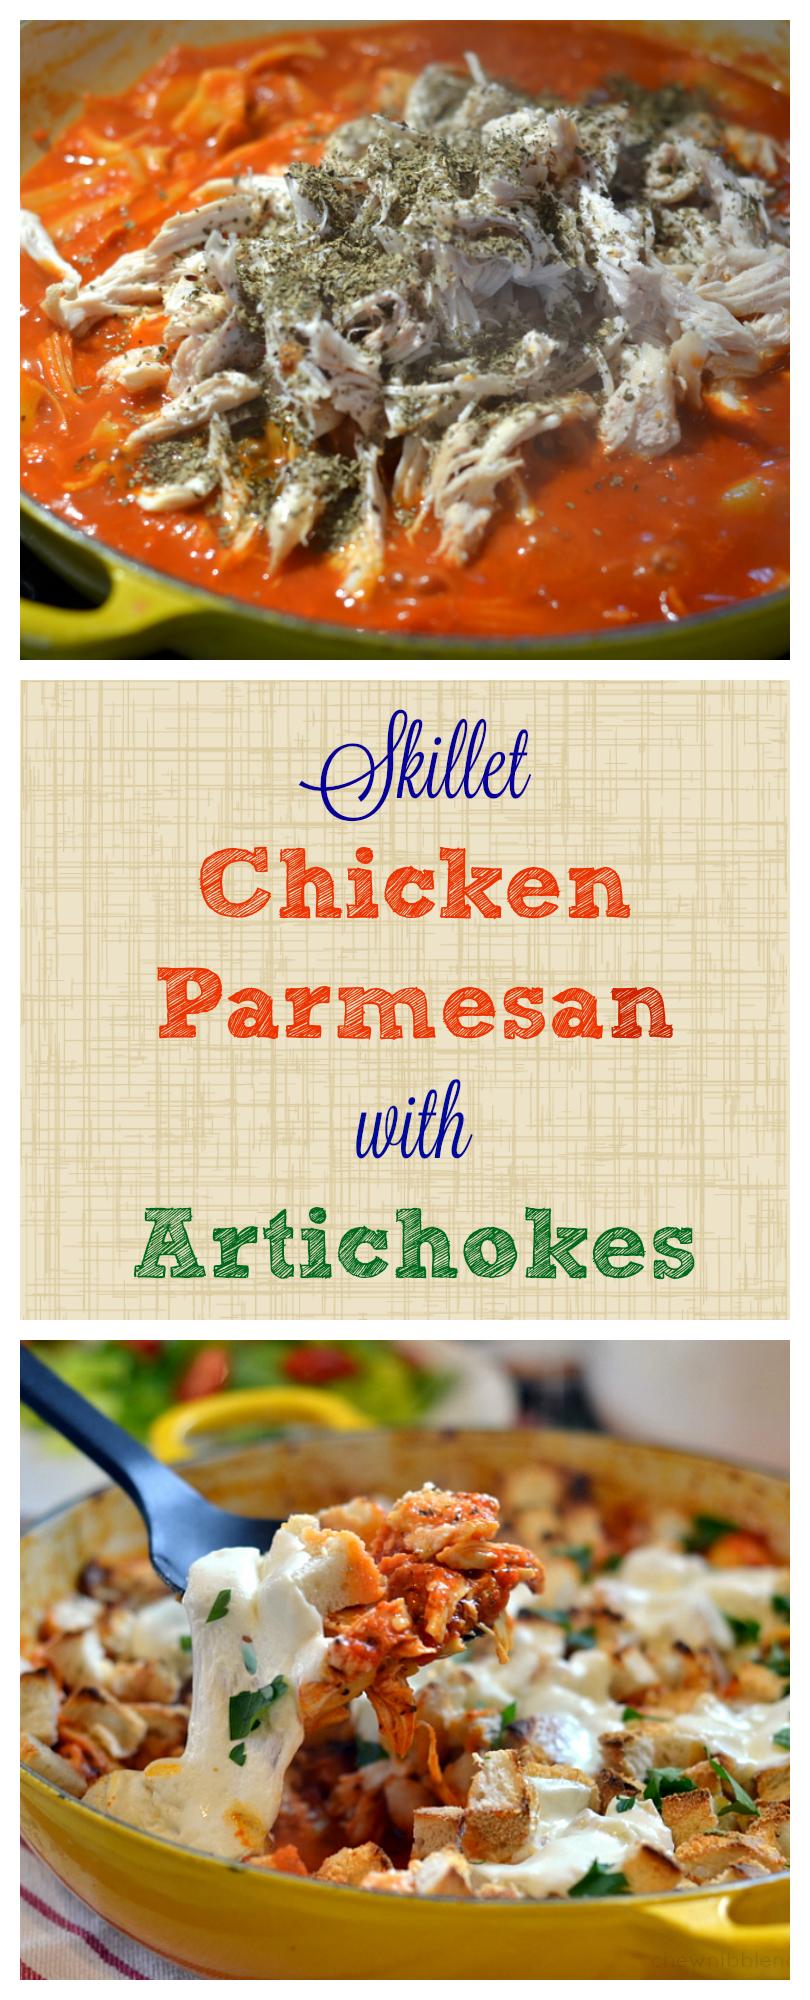 Skillet Chicken Parmesan with Artichokes -Chew Nibble Nosh